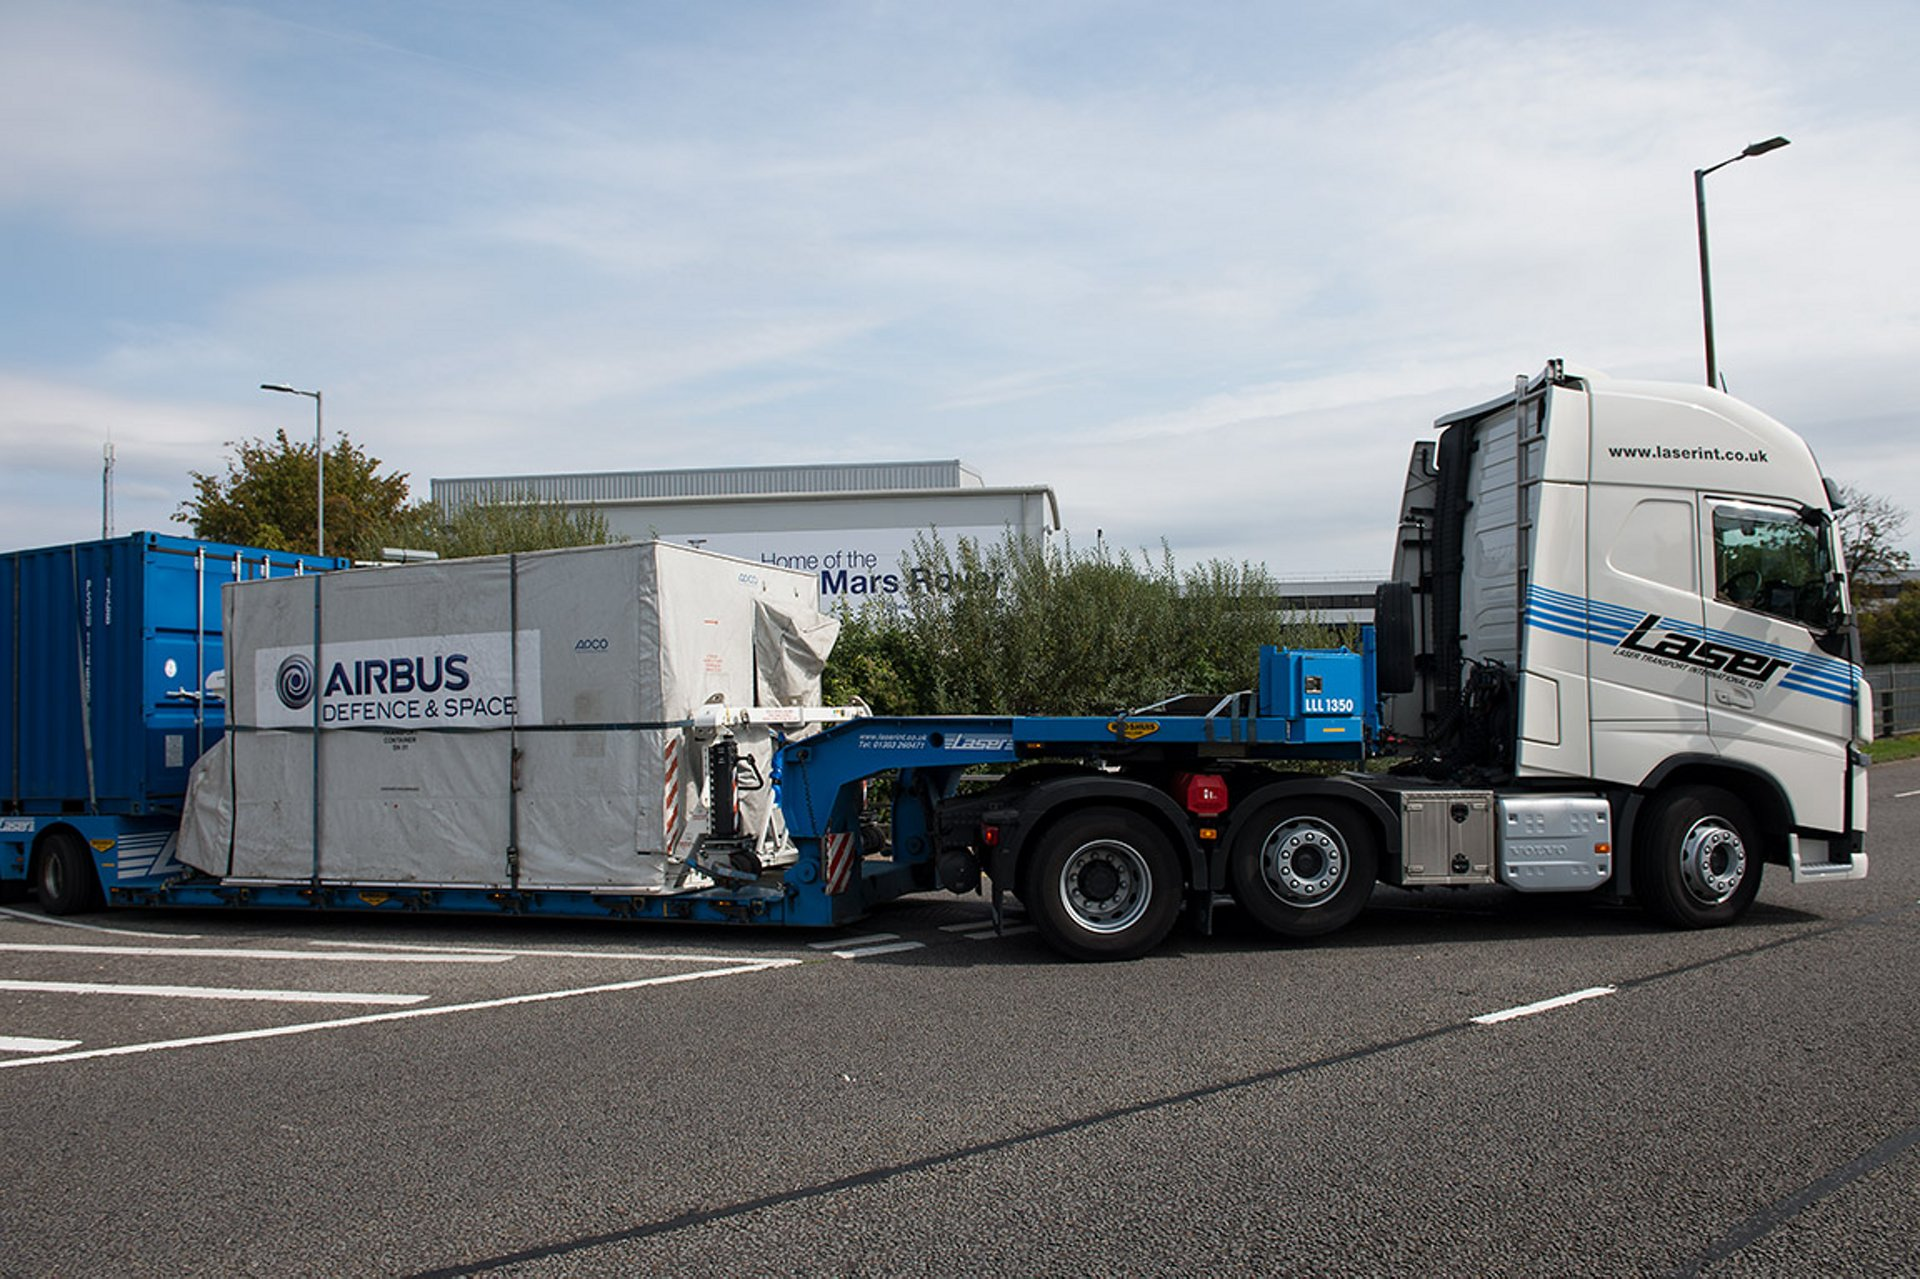 Airbus-built Sentinel-5P satellite leaving Stevenage facility